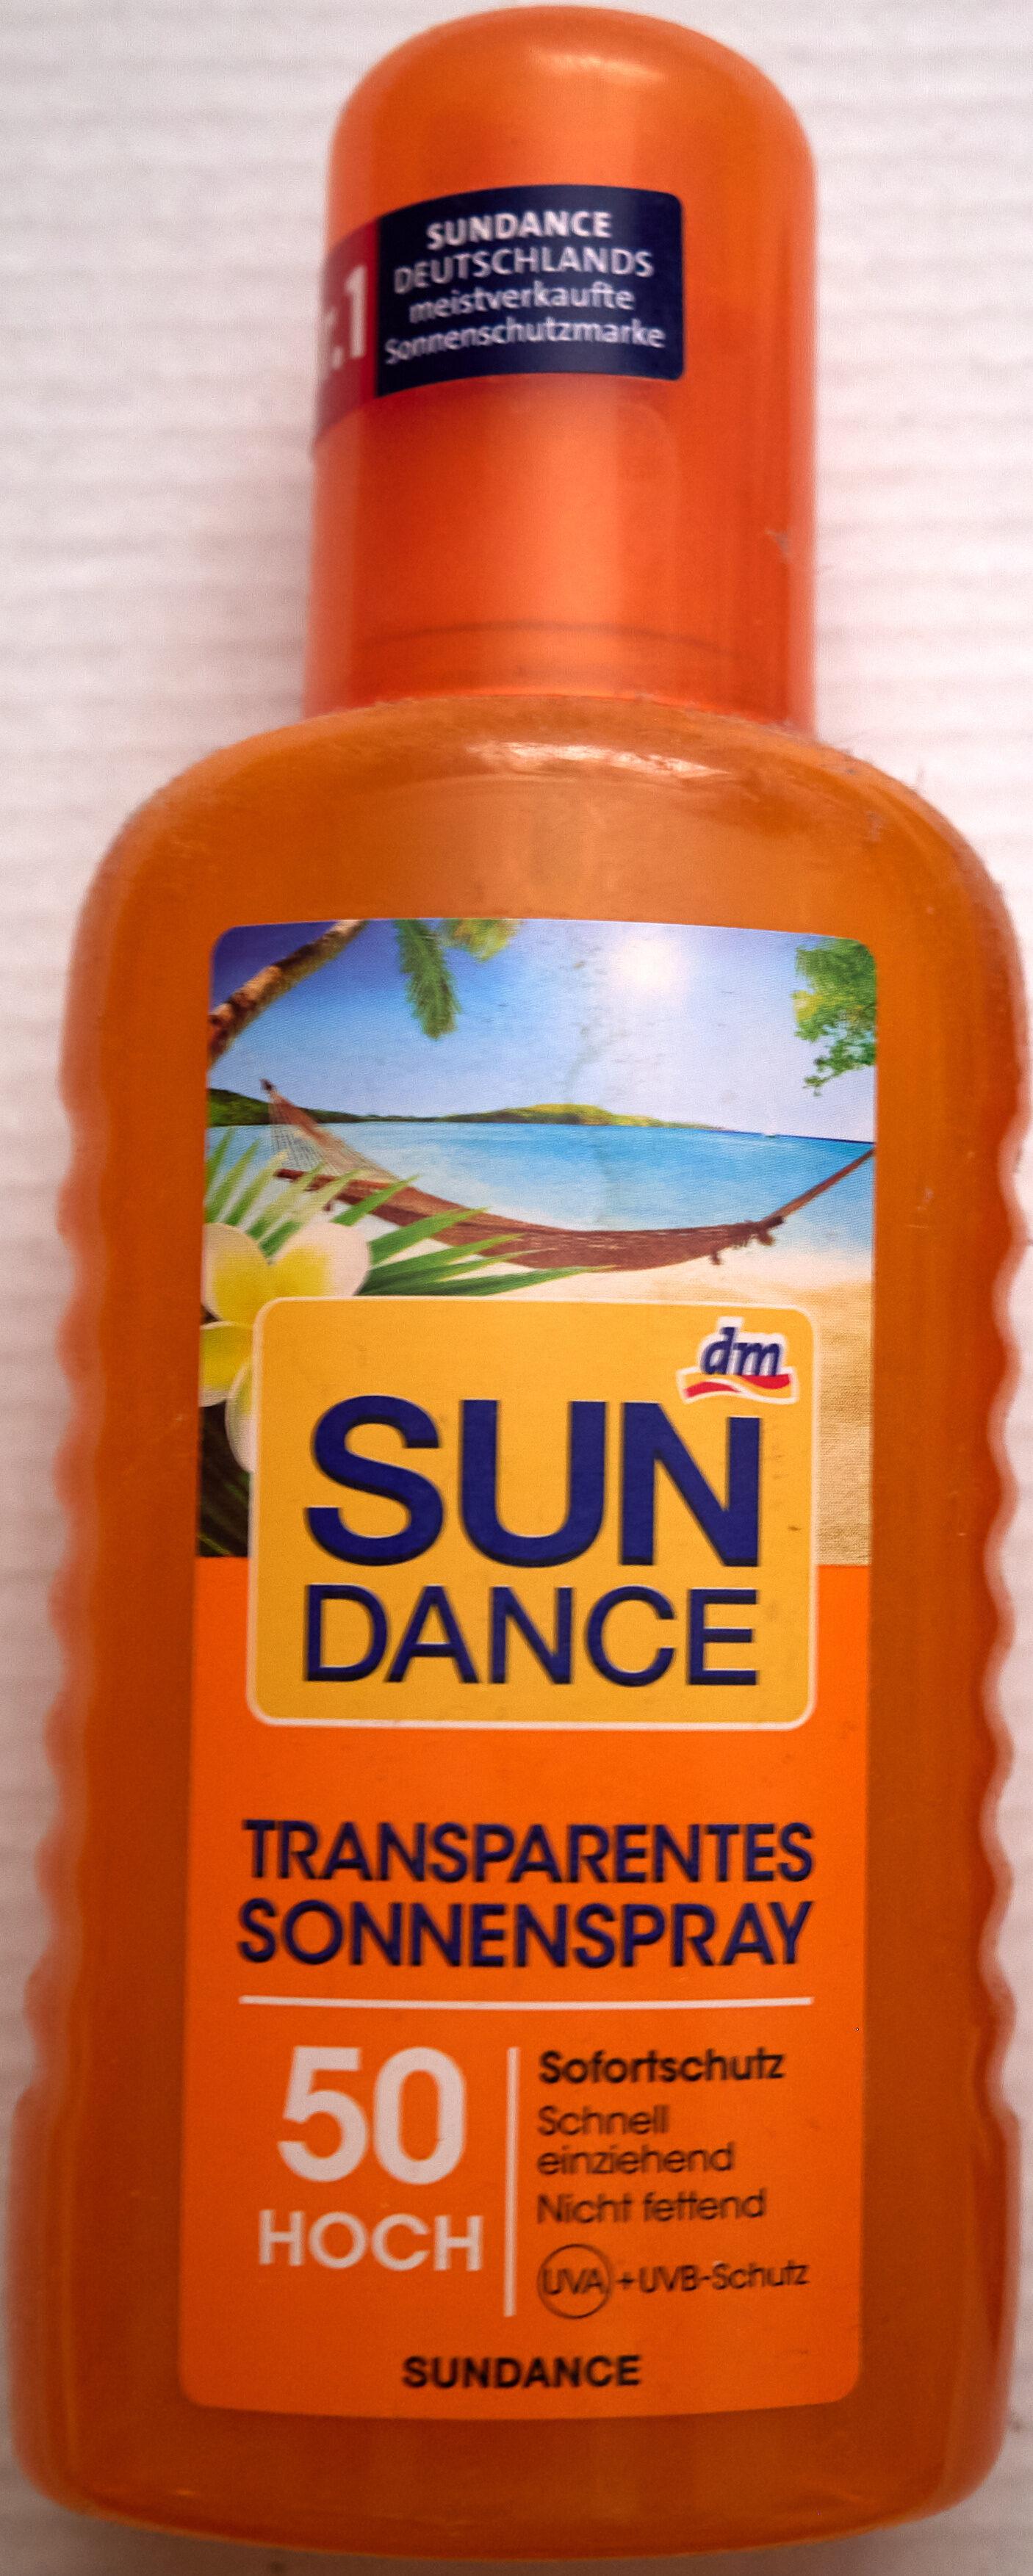 Transparentes Sonnenspray LSF 50 hoch - Продукт - en